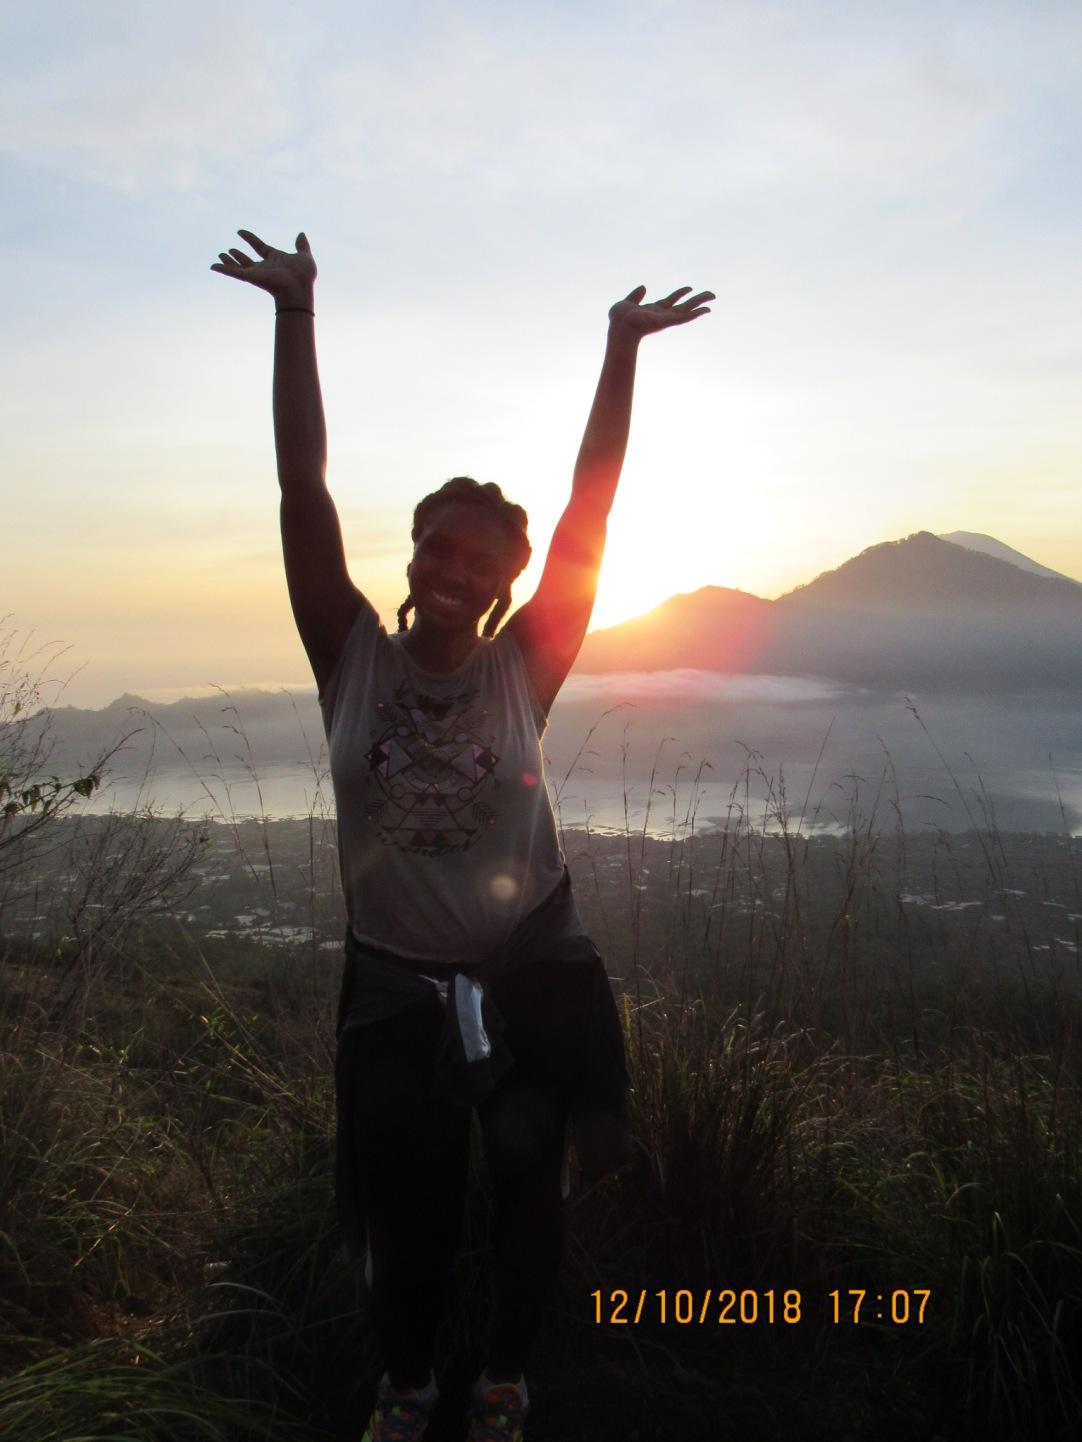 Me at the top of Mount Batur